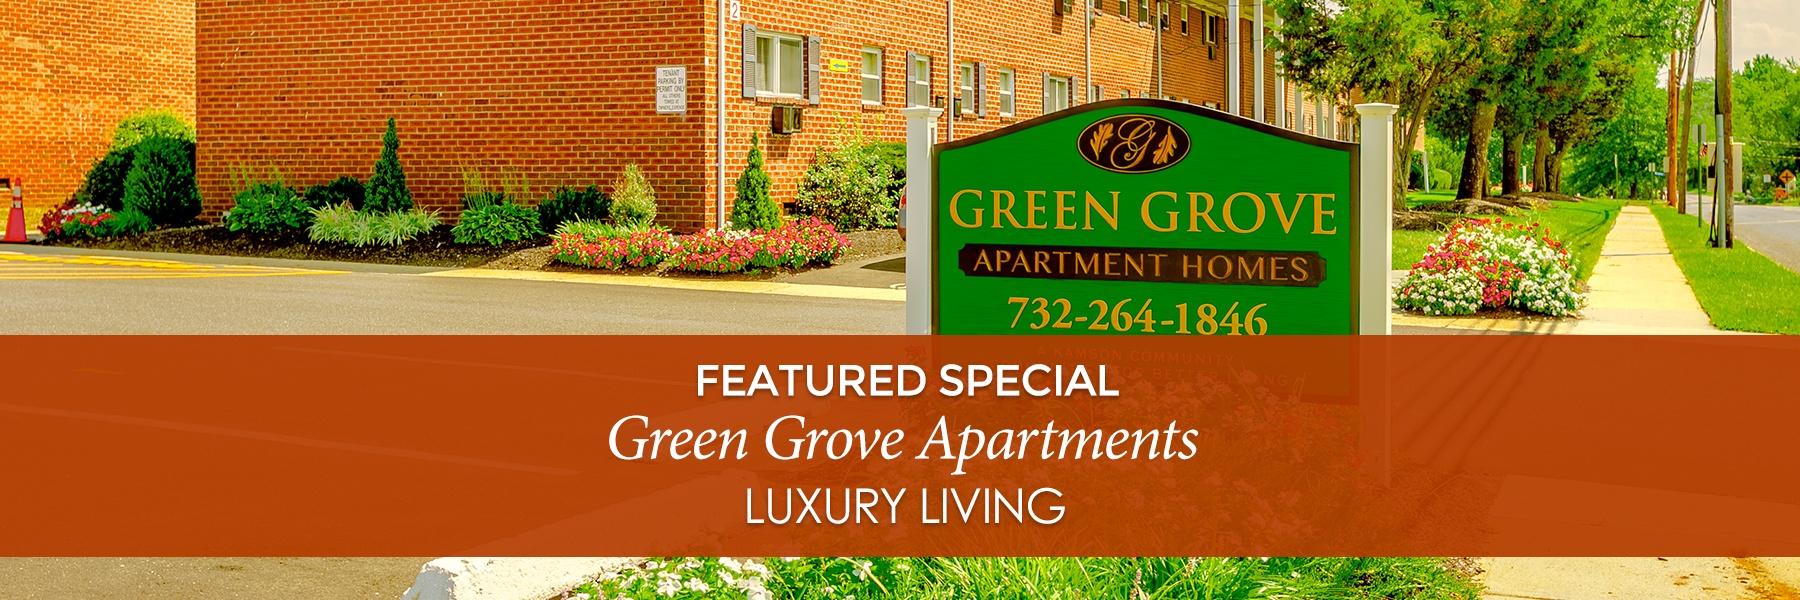 Green Grove Apartments For Rent in Keyport, NJ Specials